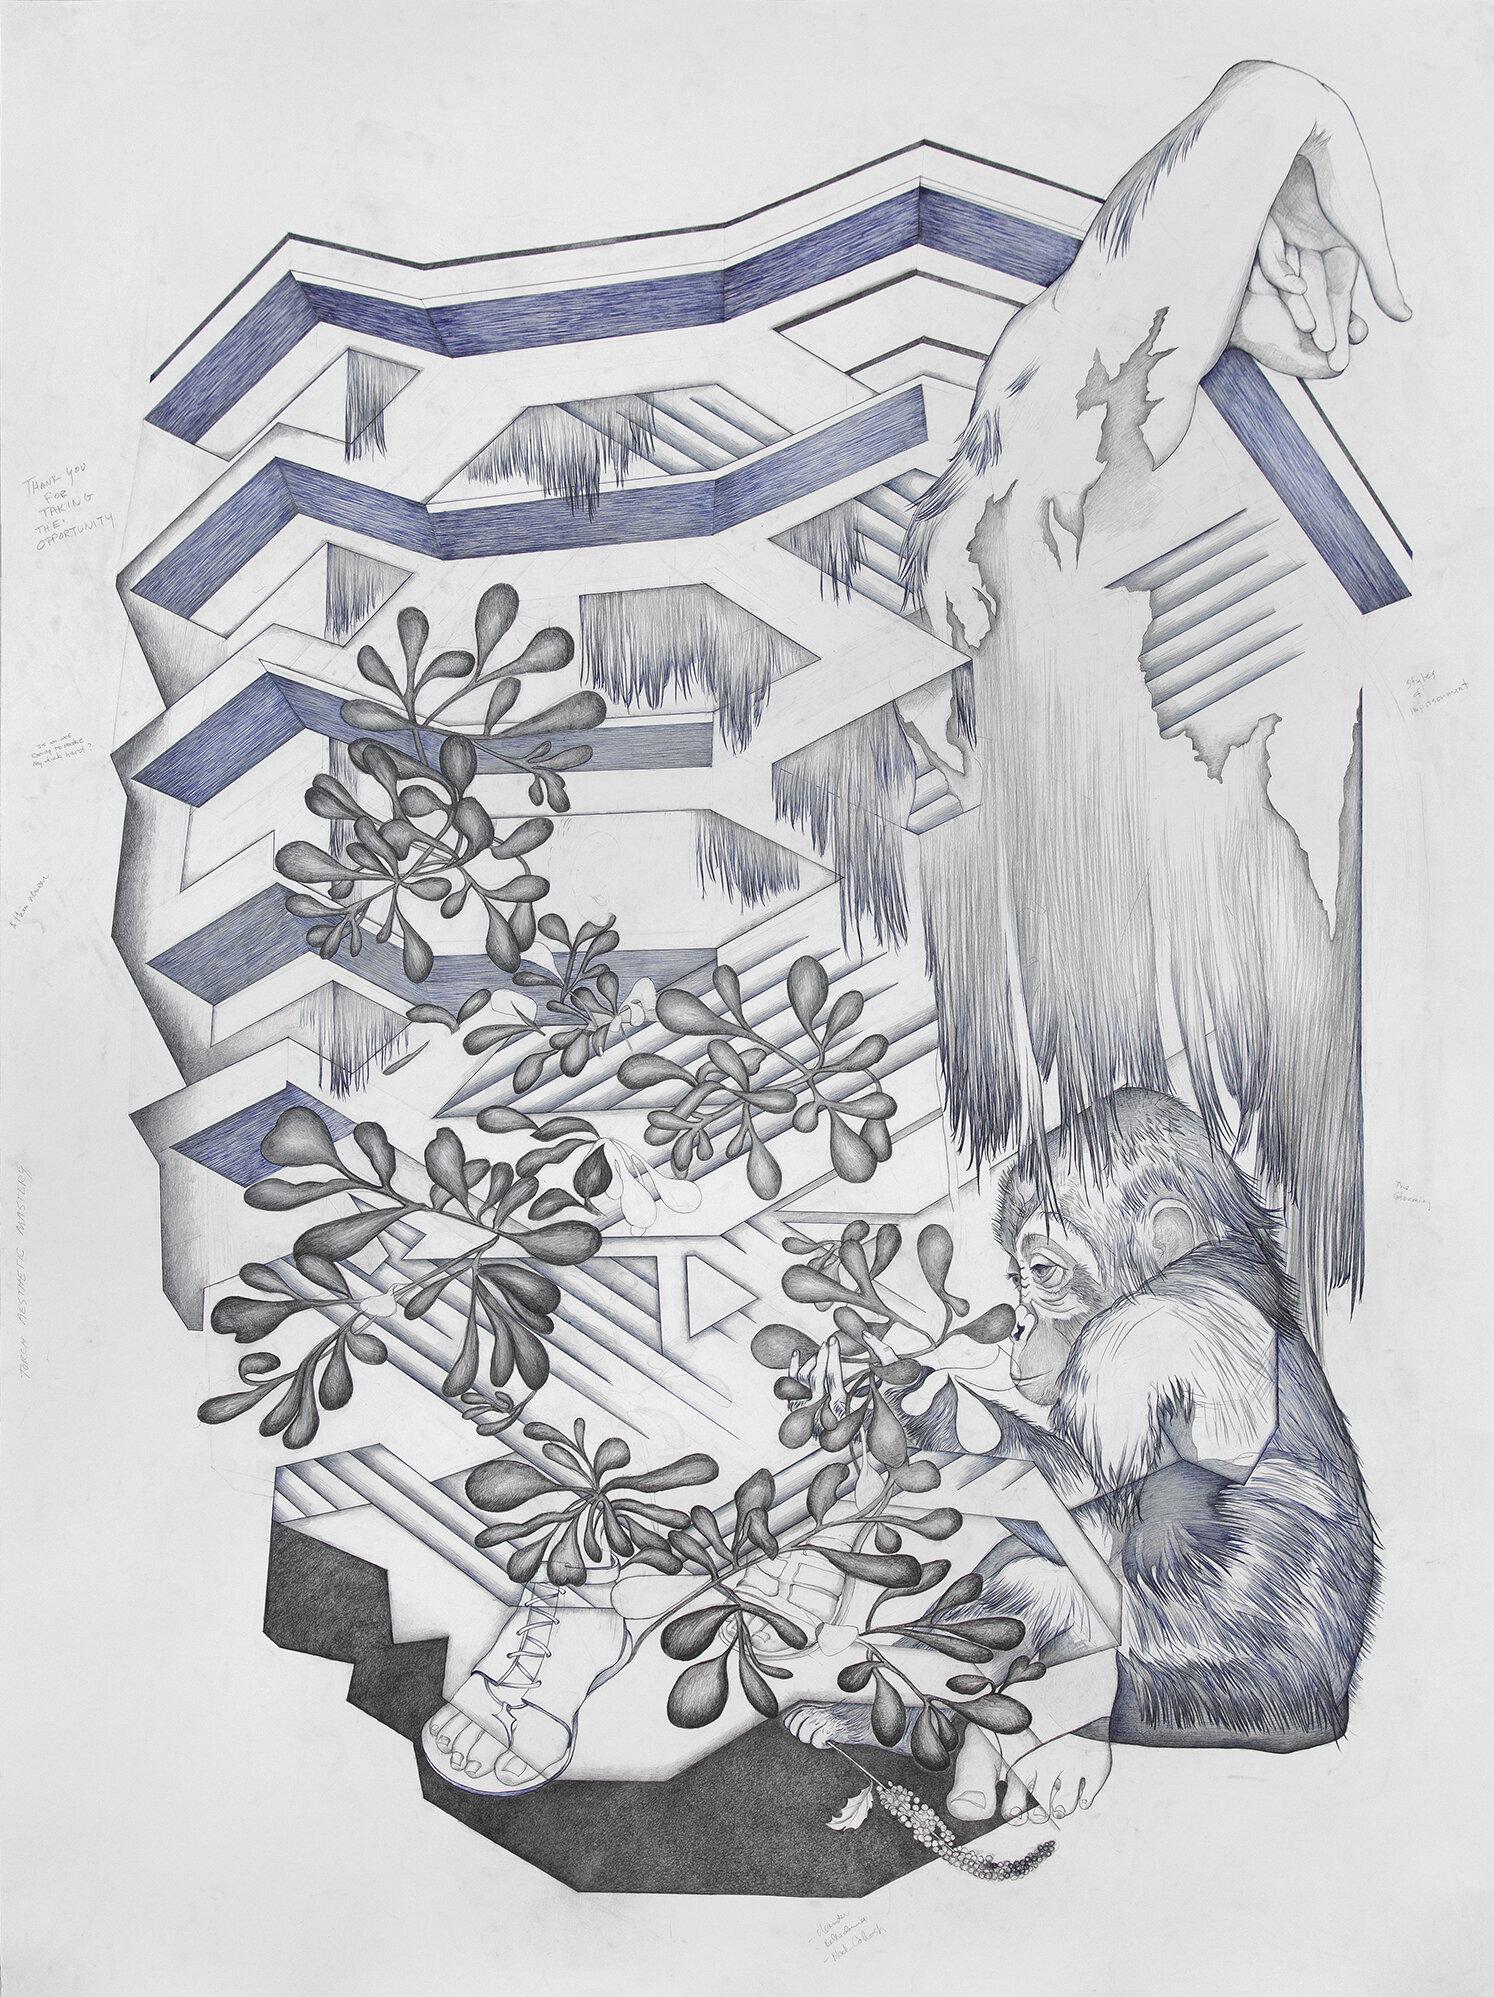 Lenape, da Verrazzano, Patrician Sandal, New Amsterdam, Vessel, Wonderment, Rue, Mutagenic Growth, Hepatic Toxicity.